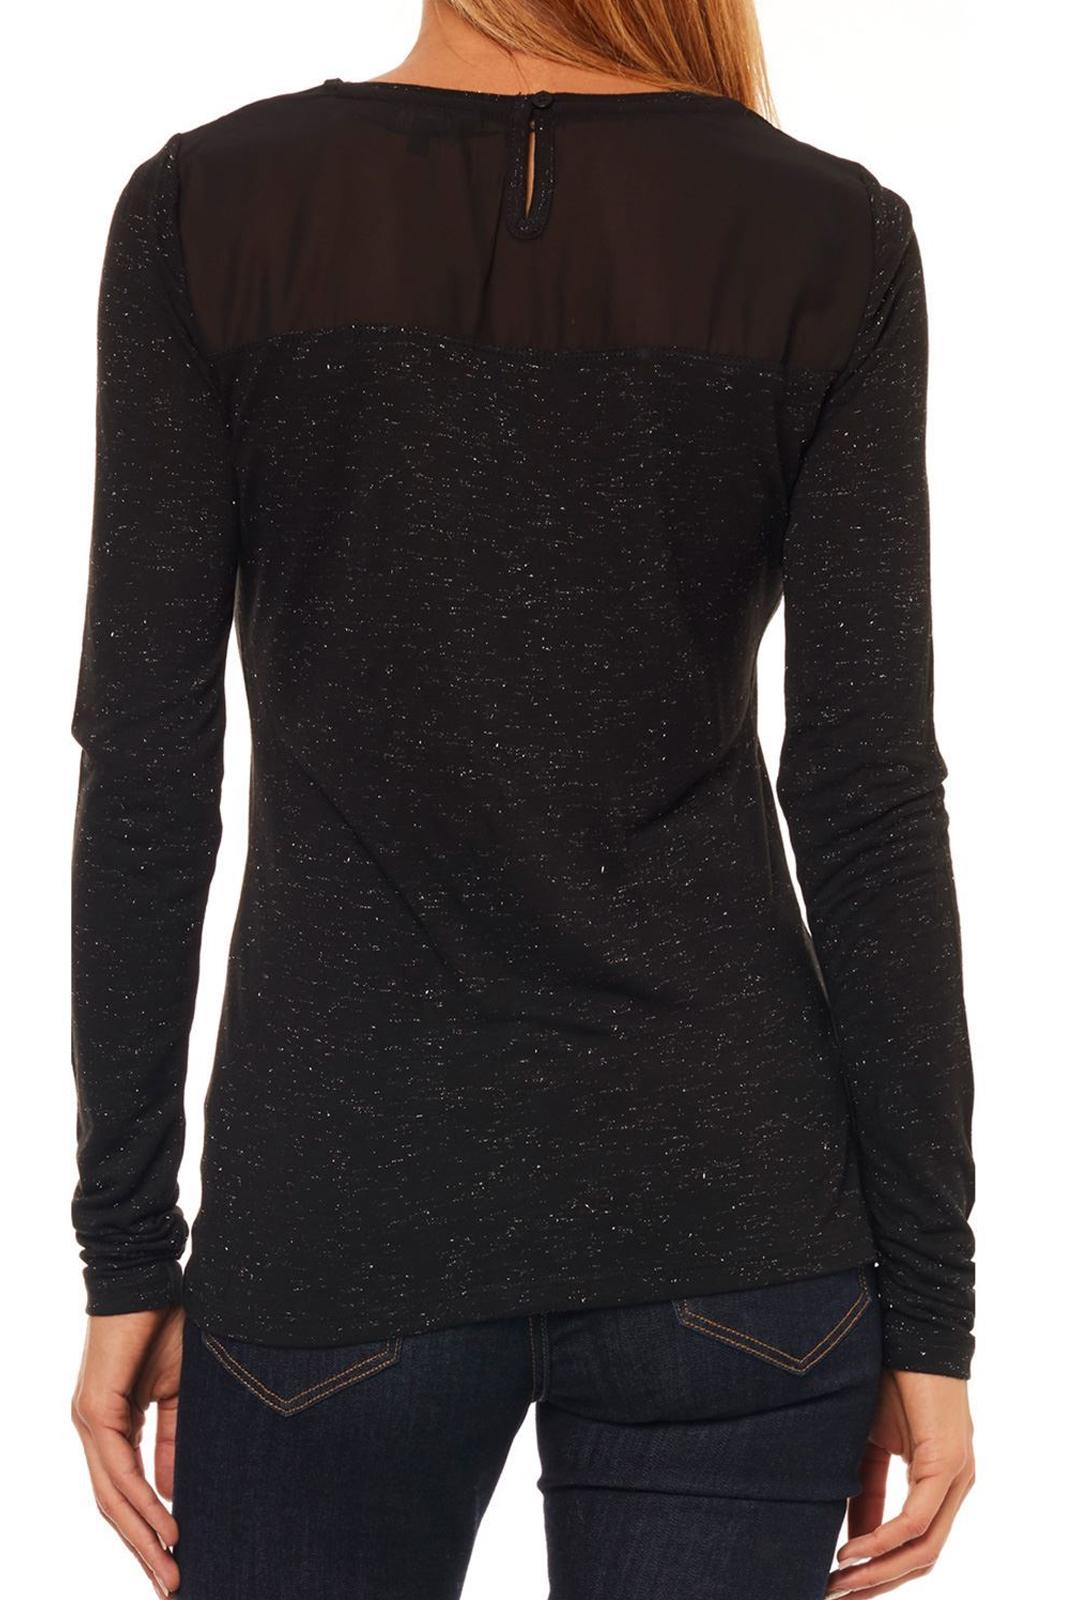 Tee shirt manches longues  Kaporal CHAI BLACK